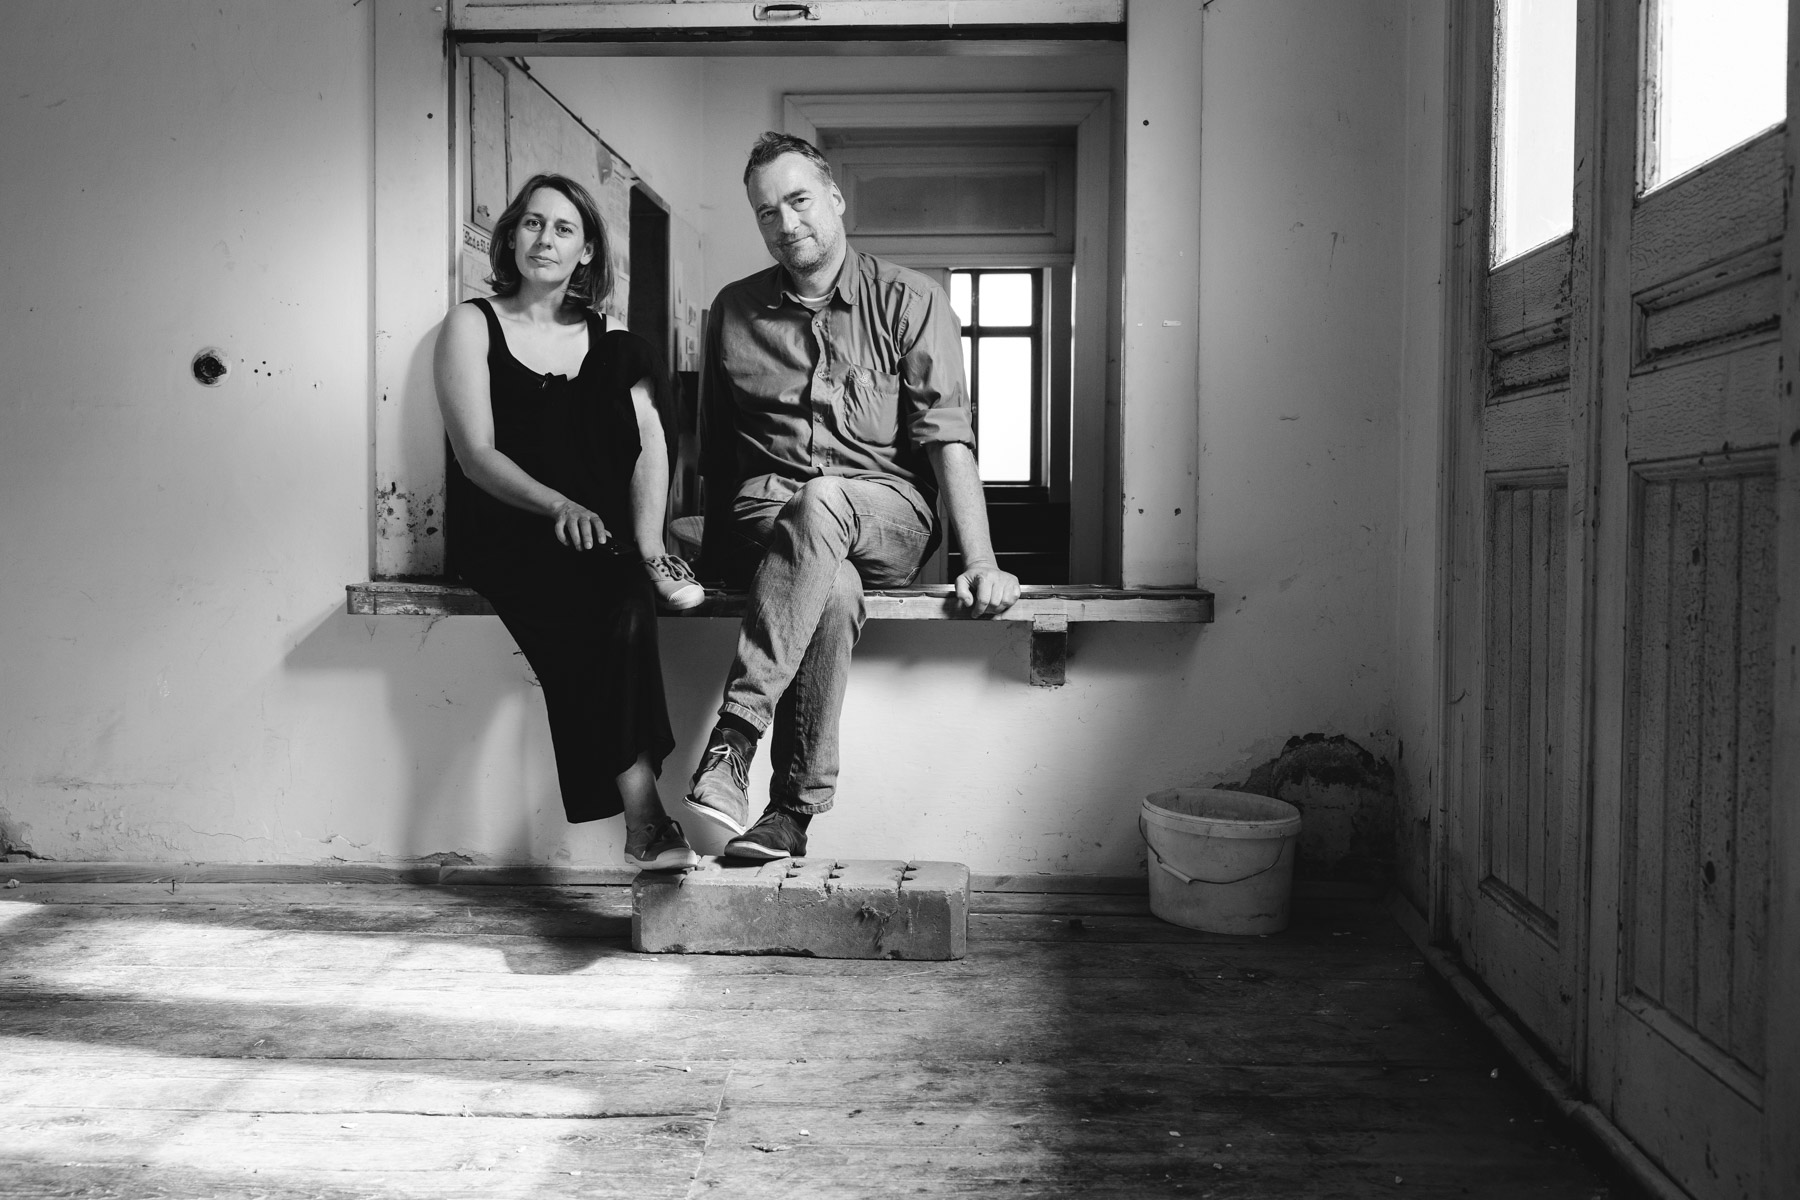 Fotografie am Bahnhof: Lisa Lux und Andreas Bernthaler (c)lisalux